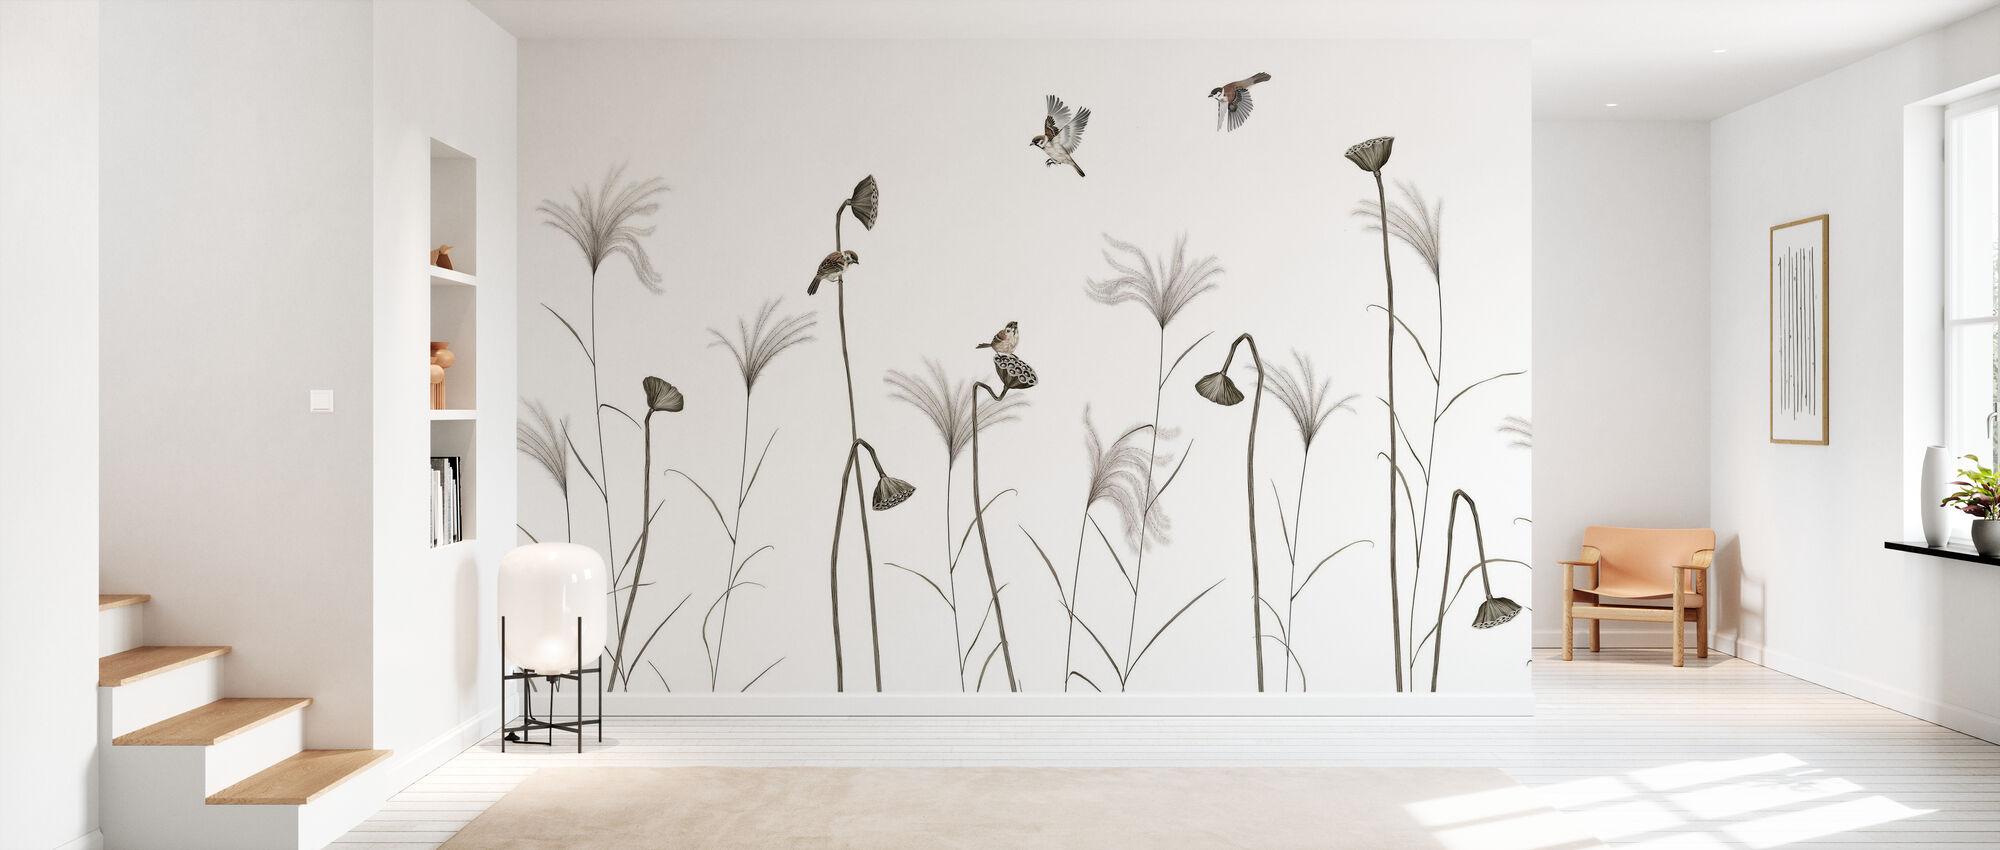 Fly and Jive - Wallpaper - Hallway